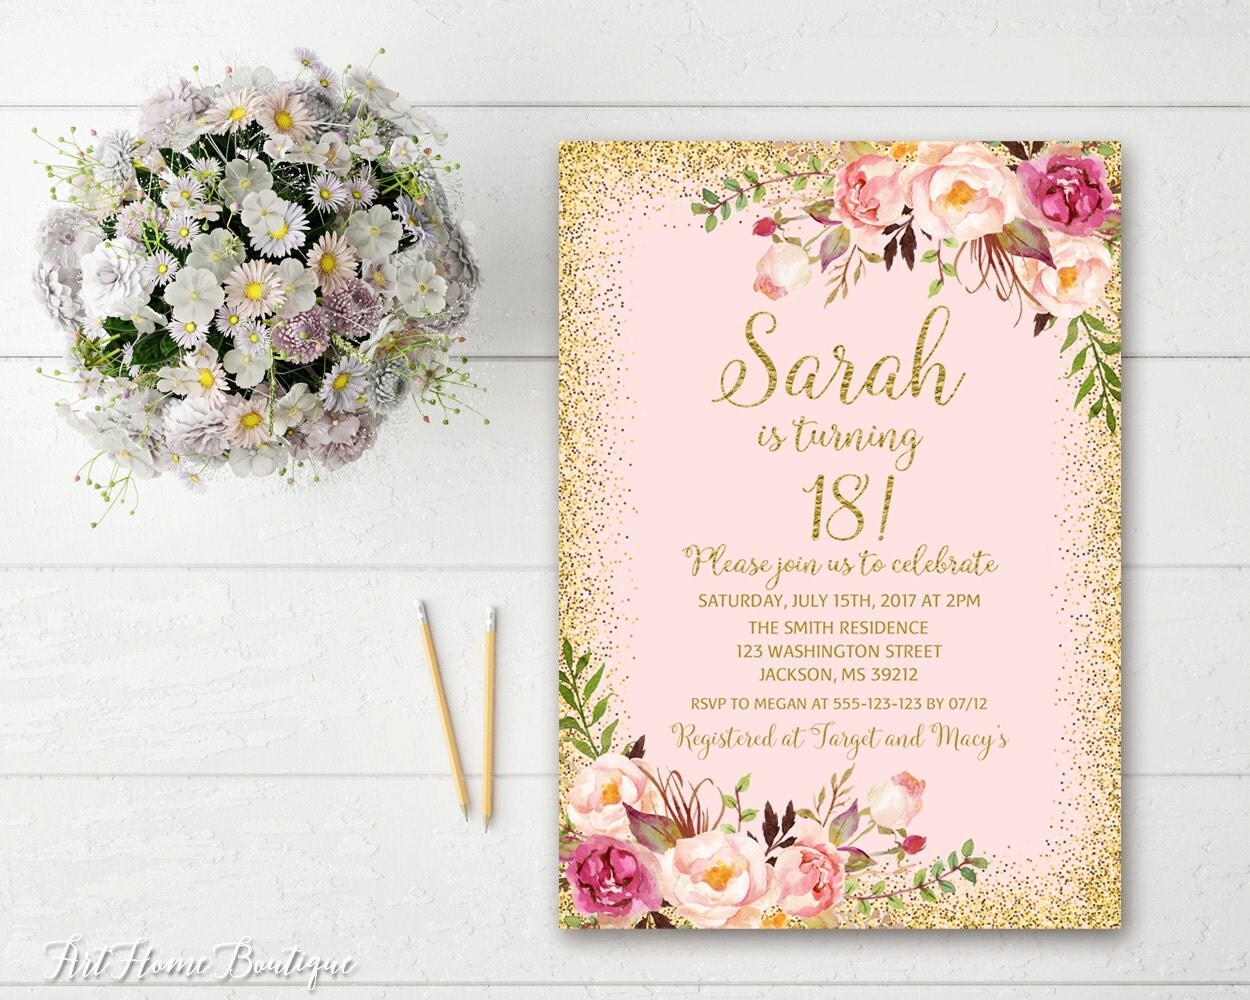 18th Birthday Invitation Any Age Women Birthday Invitation – Invitations 18th Birthday